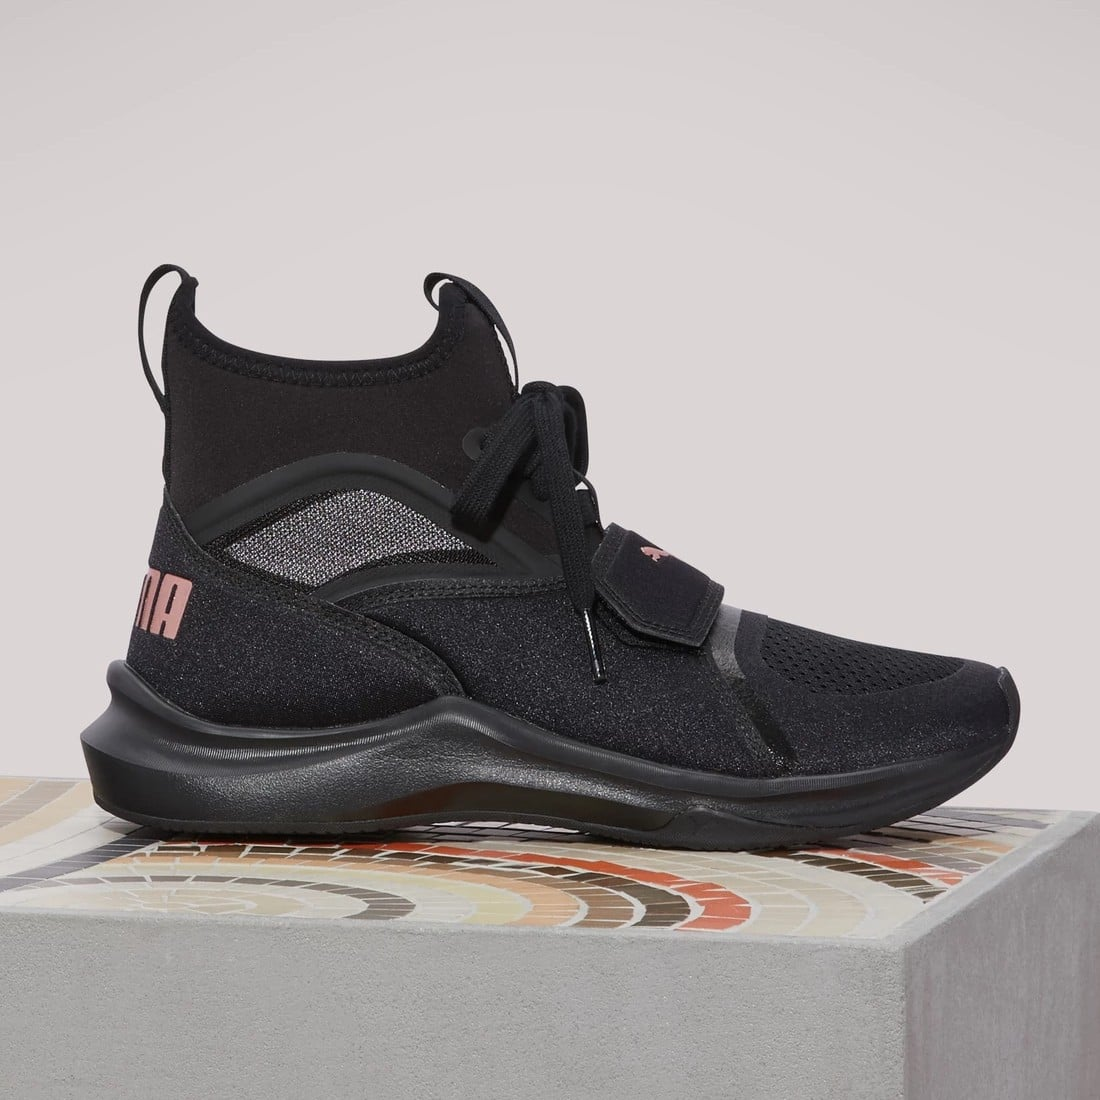 d77efef668d Puma Riaze Prowl Sneakers